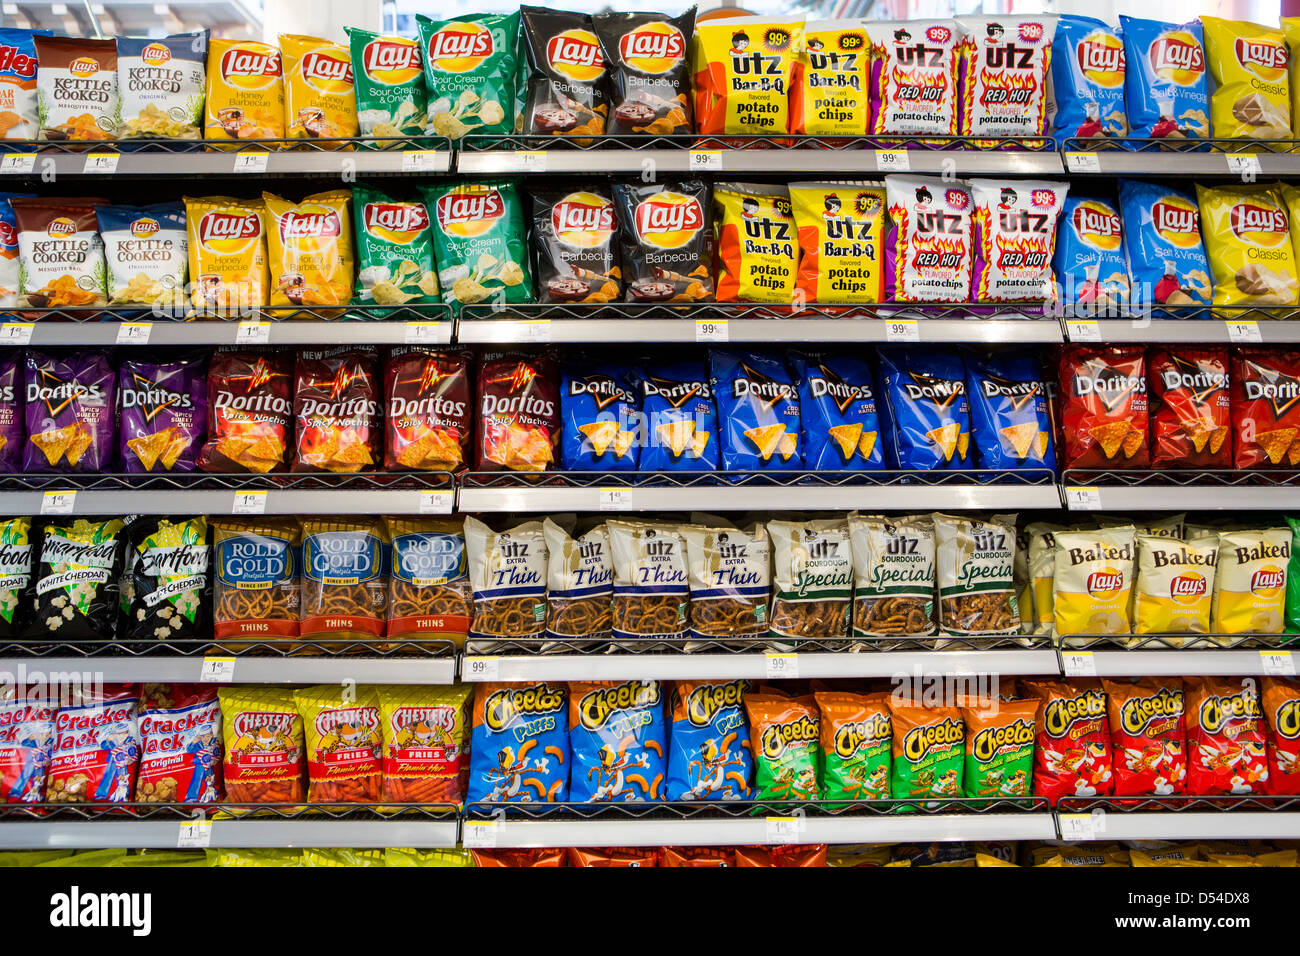 Lay S Utz And Doritos Potato Chips On Display At A